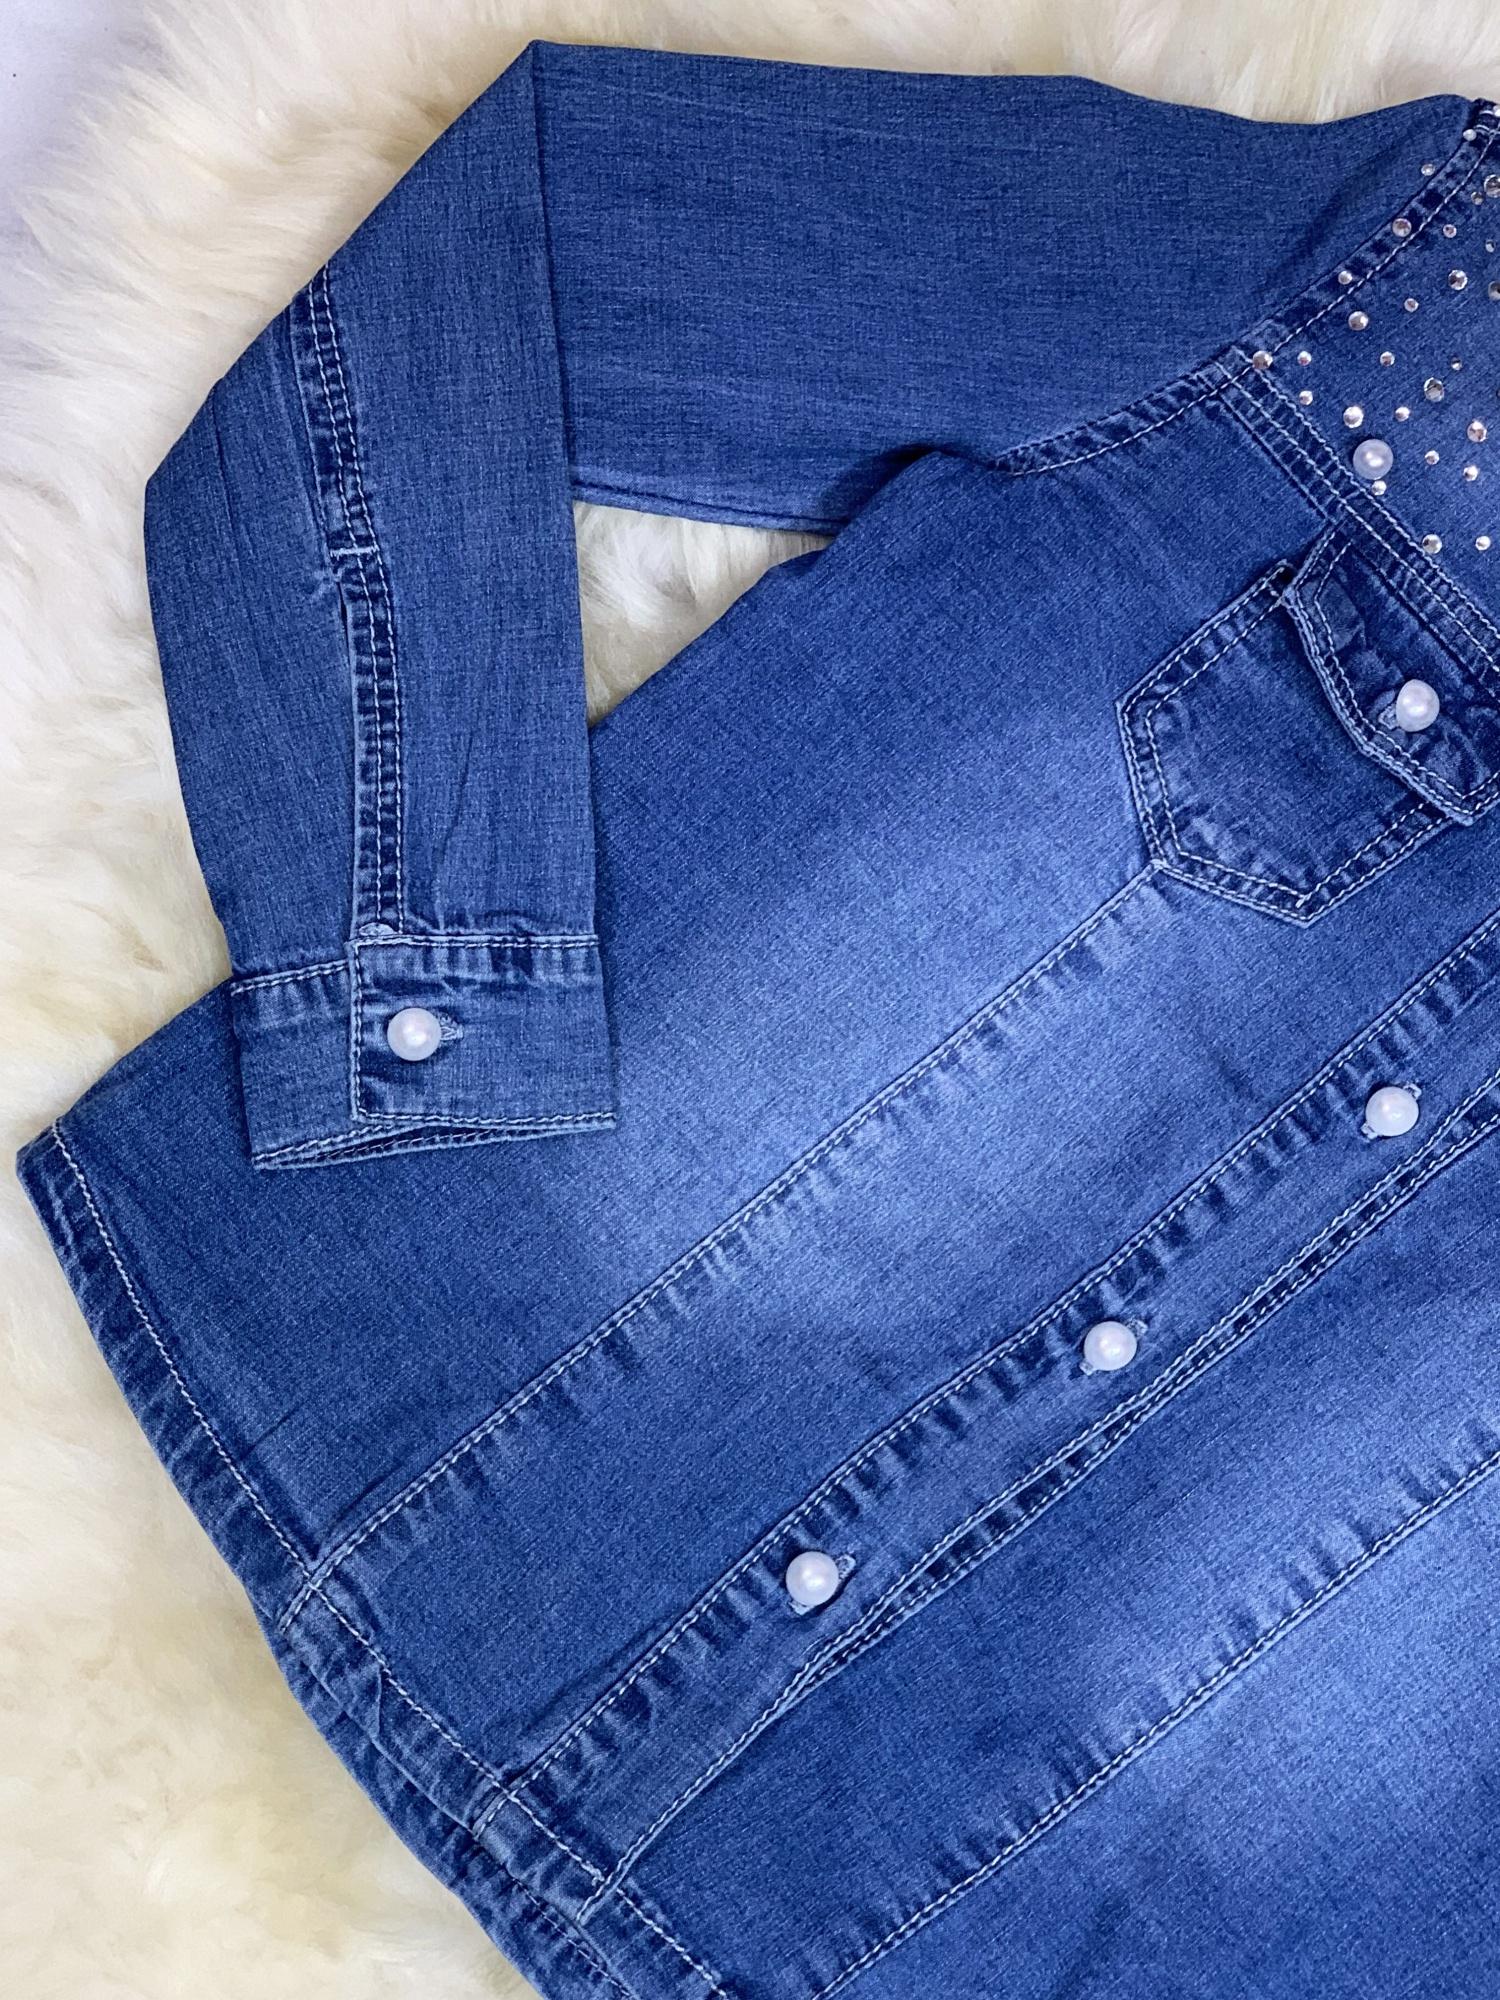 Koszula jeansowa Deynn z perełkami cudo vanilove.pl  RyG2D